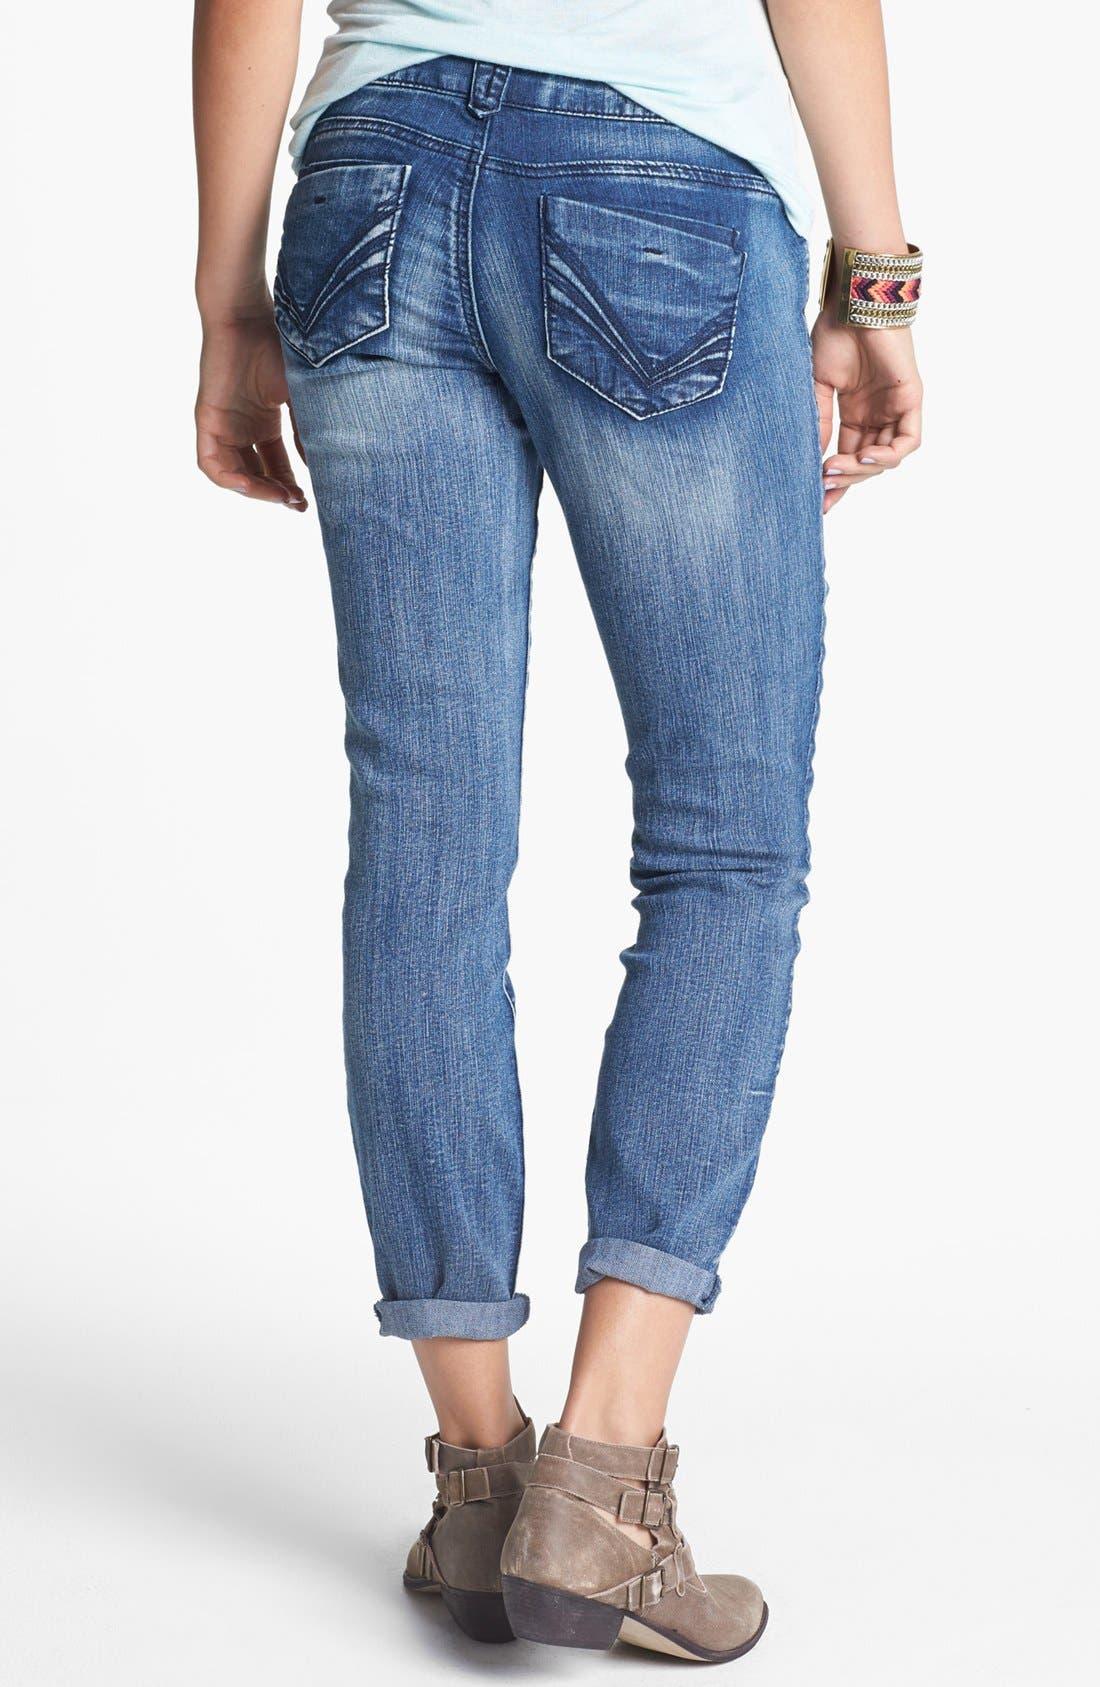 Main Image - Jolt Skinny Jeans (Indigo) (Juniors) (Online Only)